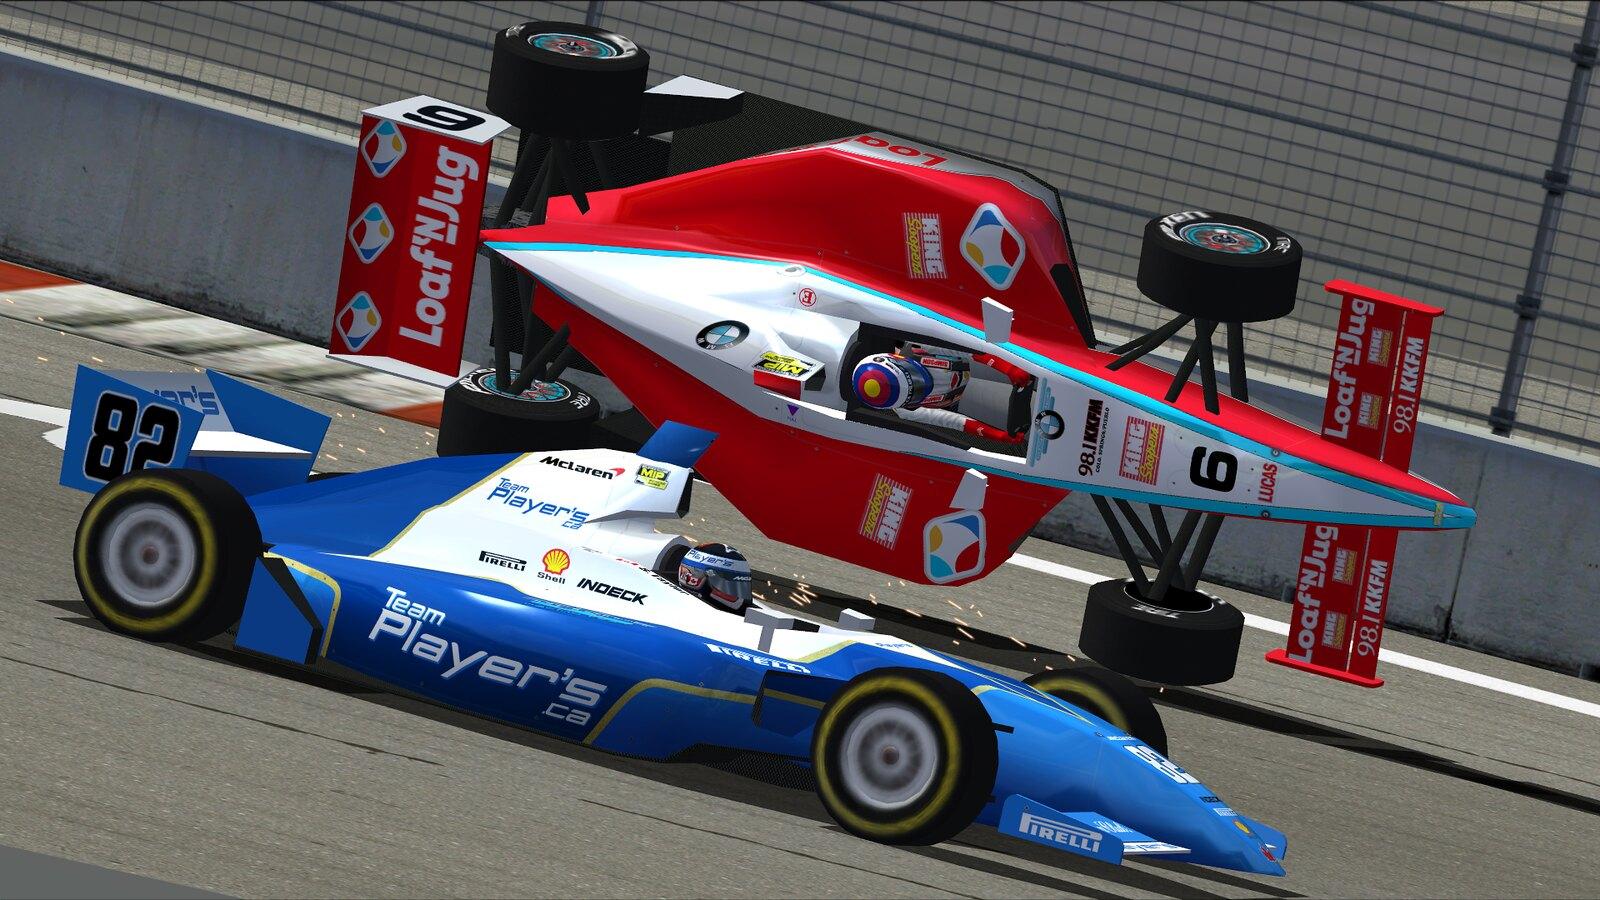 Lotus Grand Prix of Long Beach [33L] 7413265234_6eb33be6d4_h